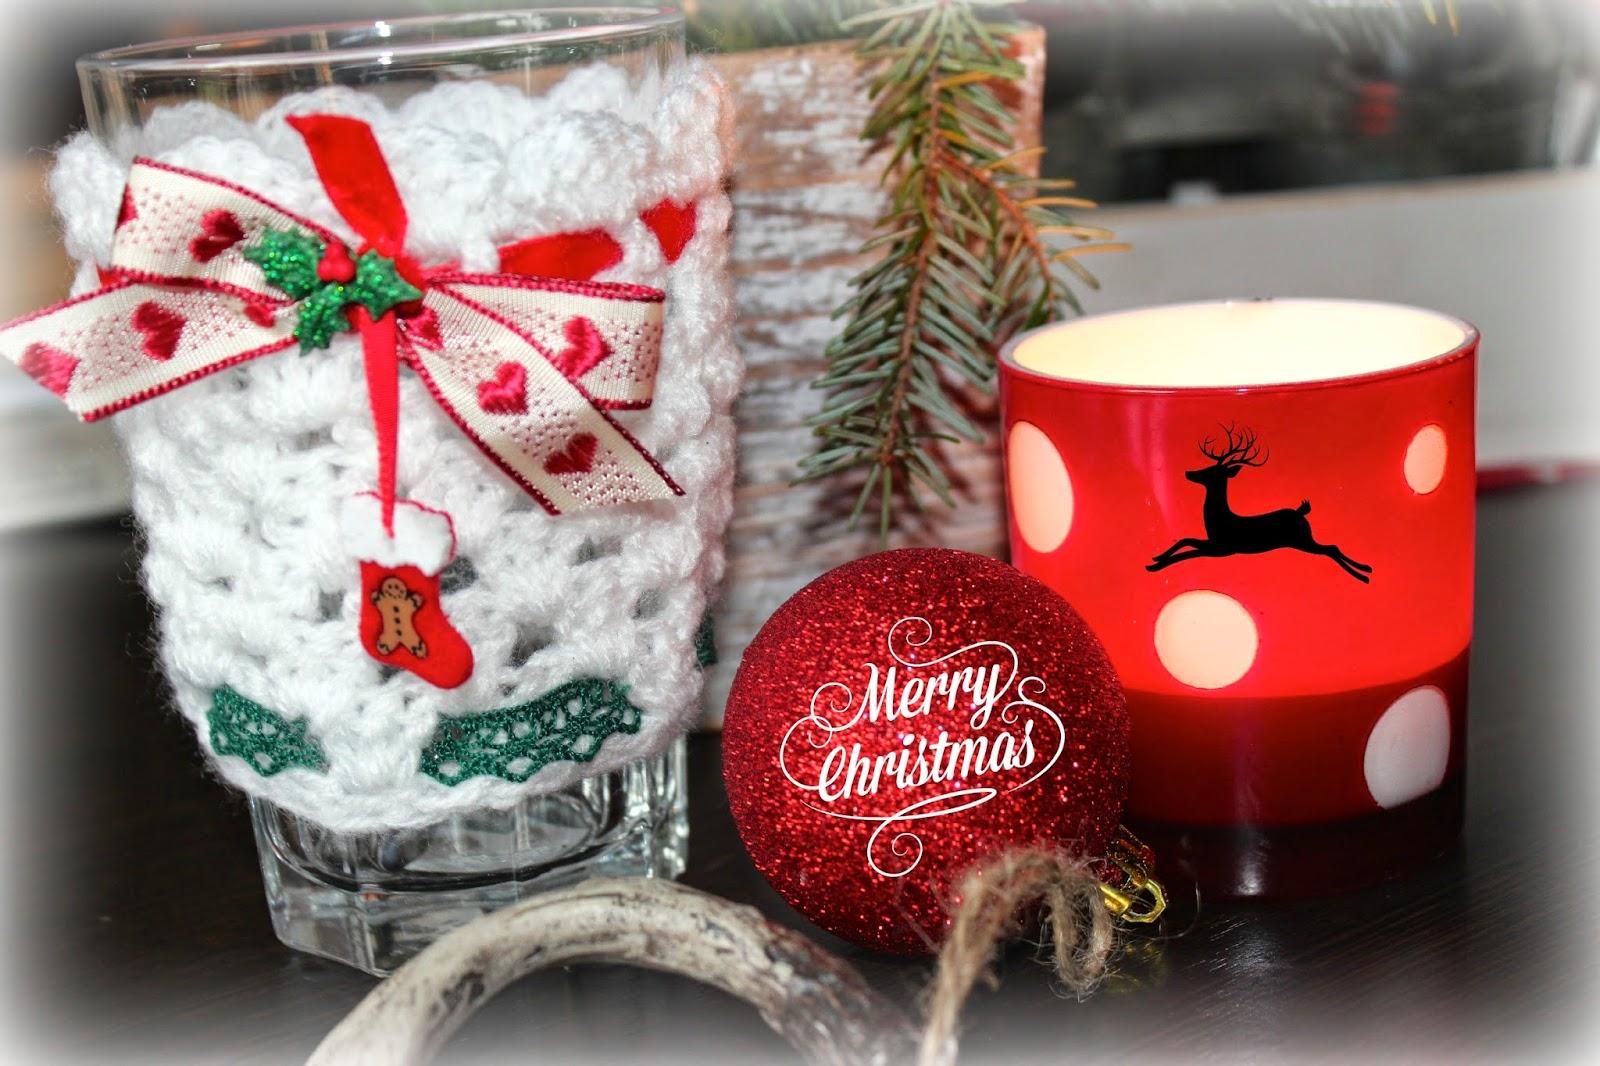 herzens frohe weihnachten. Black Bedroom Furniture Sets. Home Design Ideas